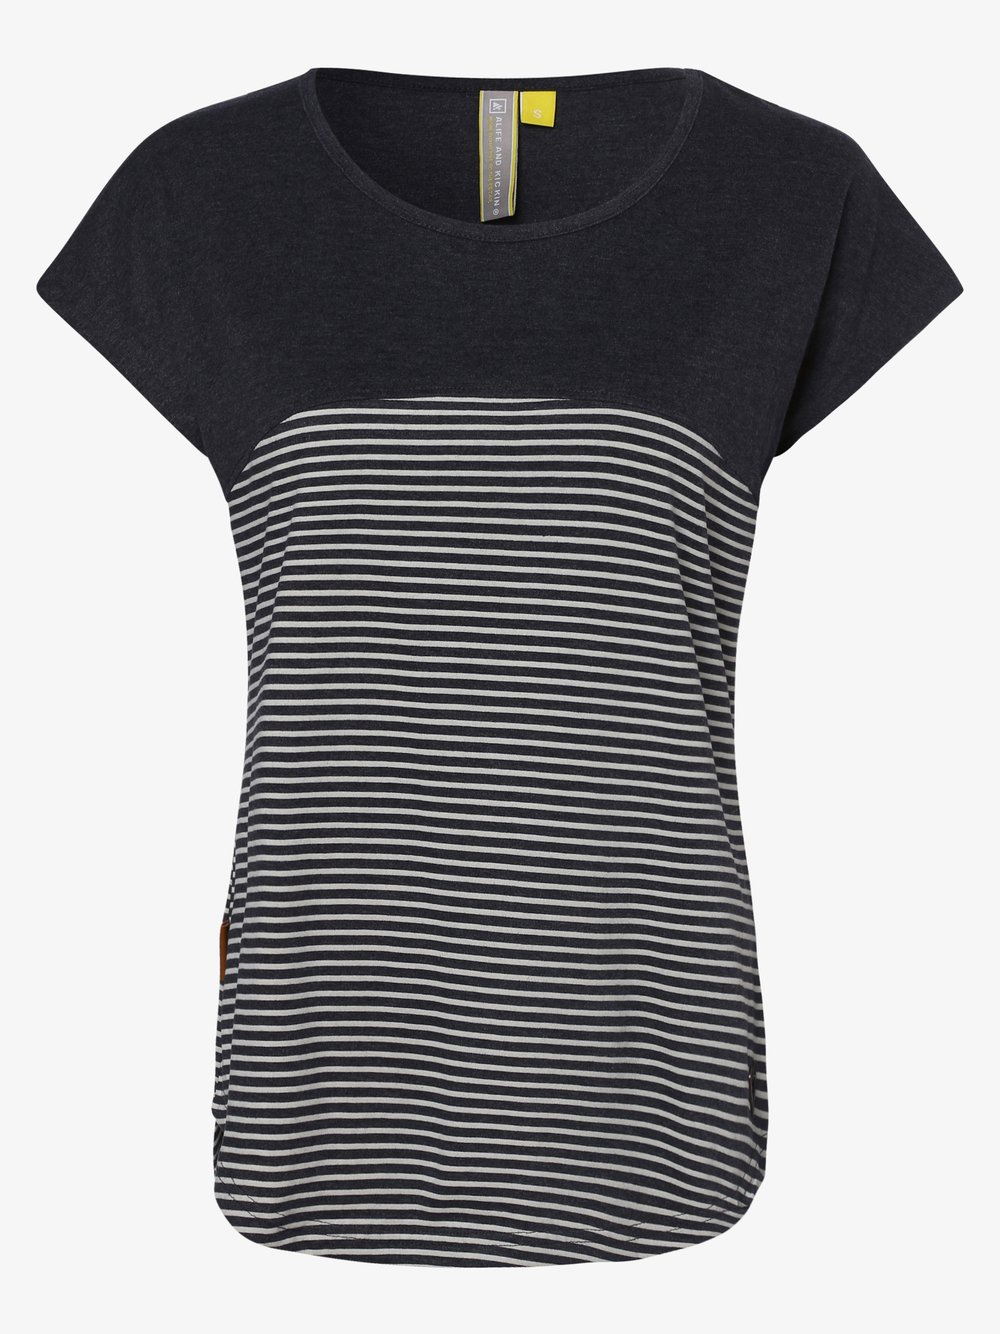 alife and kickin - T-shirt damski – ClaireAK, niebieski